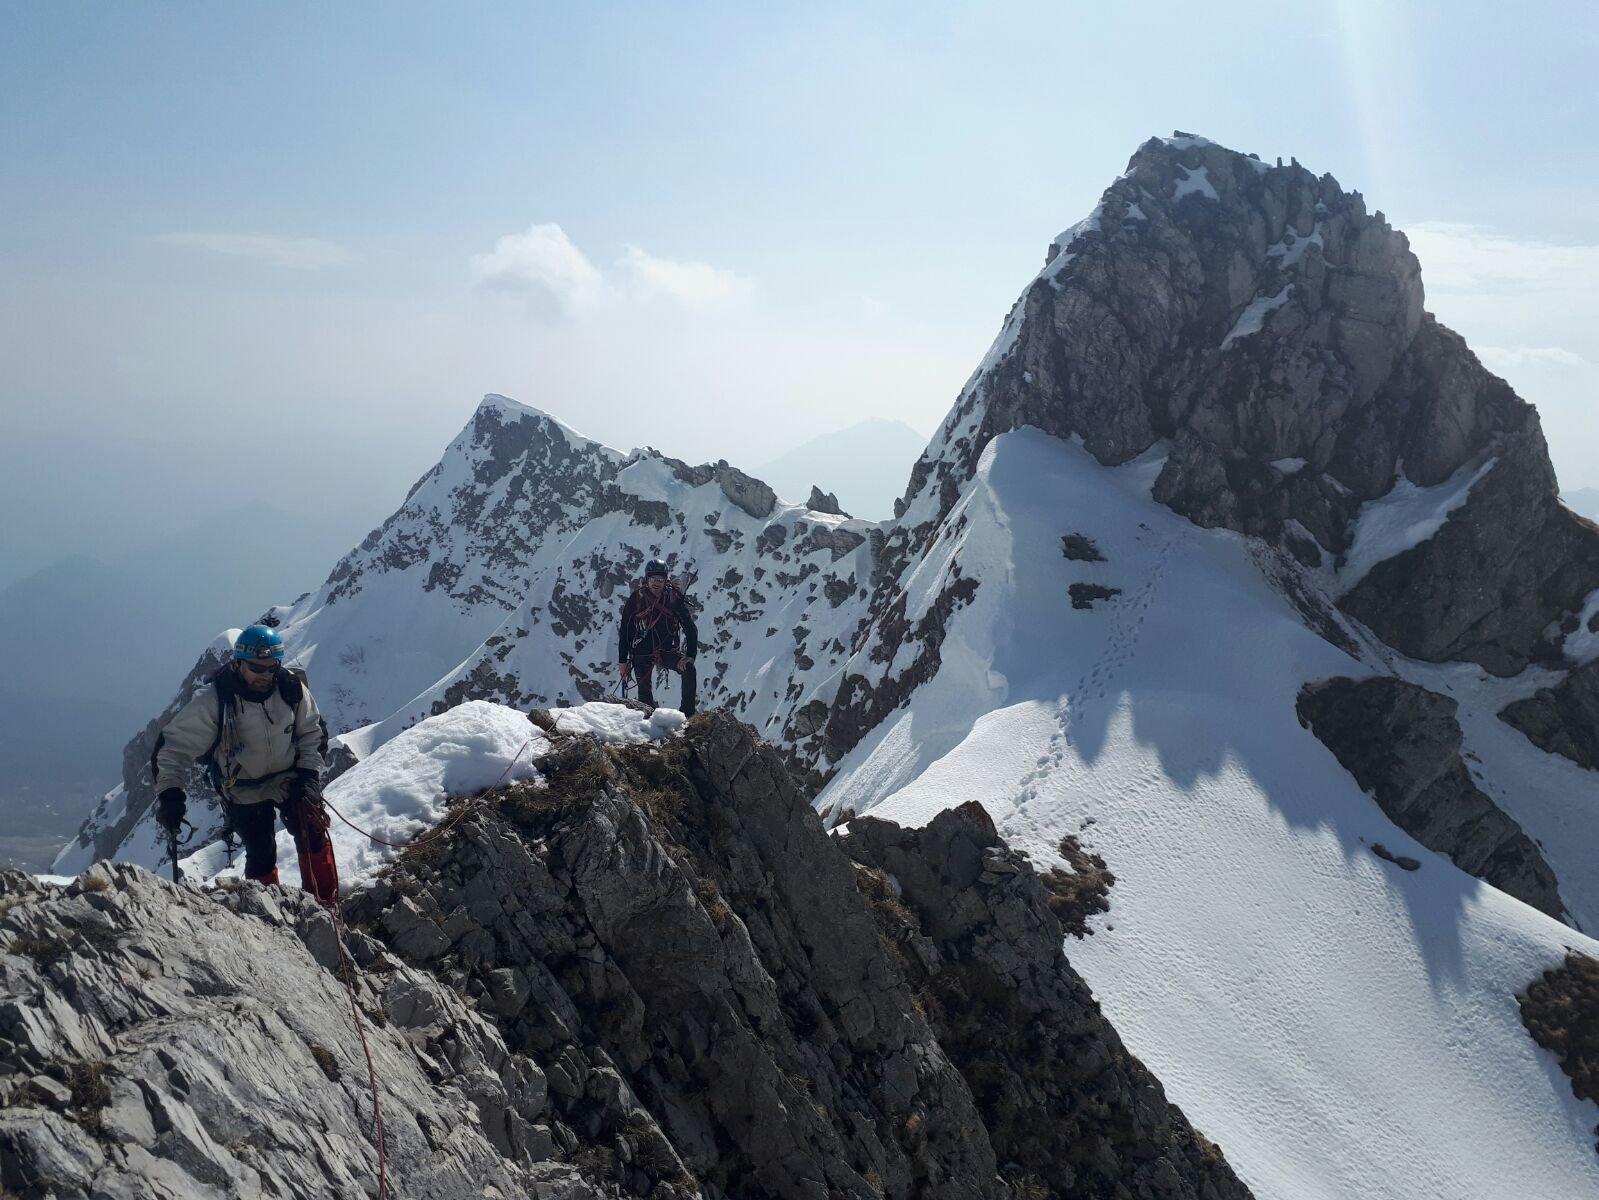 Antoroto (Monte) e Punta Armando Sereno Parete Nord (Goulotte Inshallah) e Cresta Est 2018-04-07